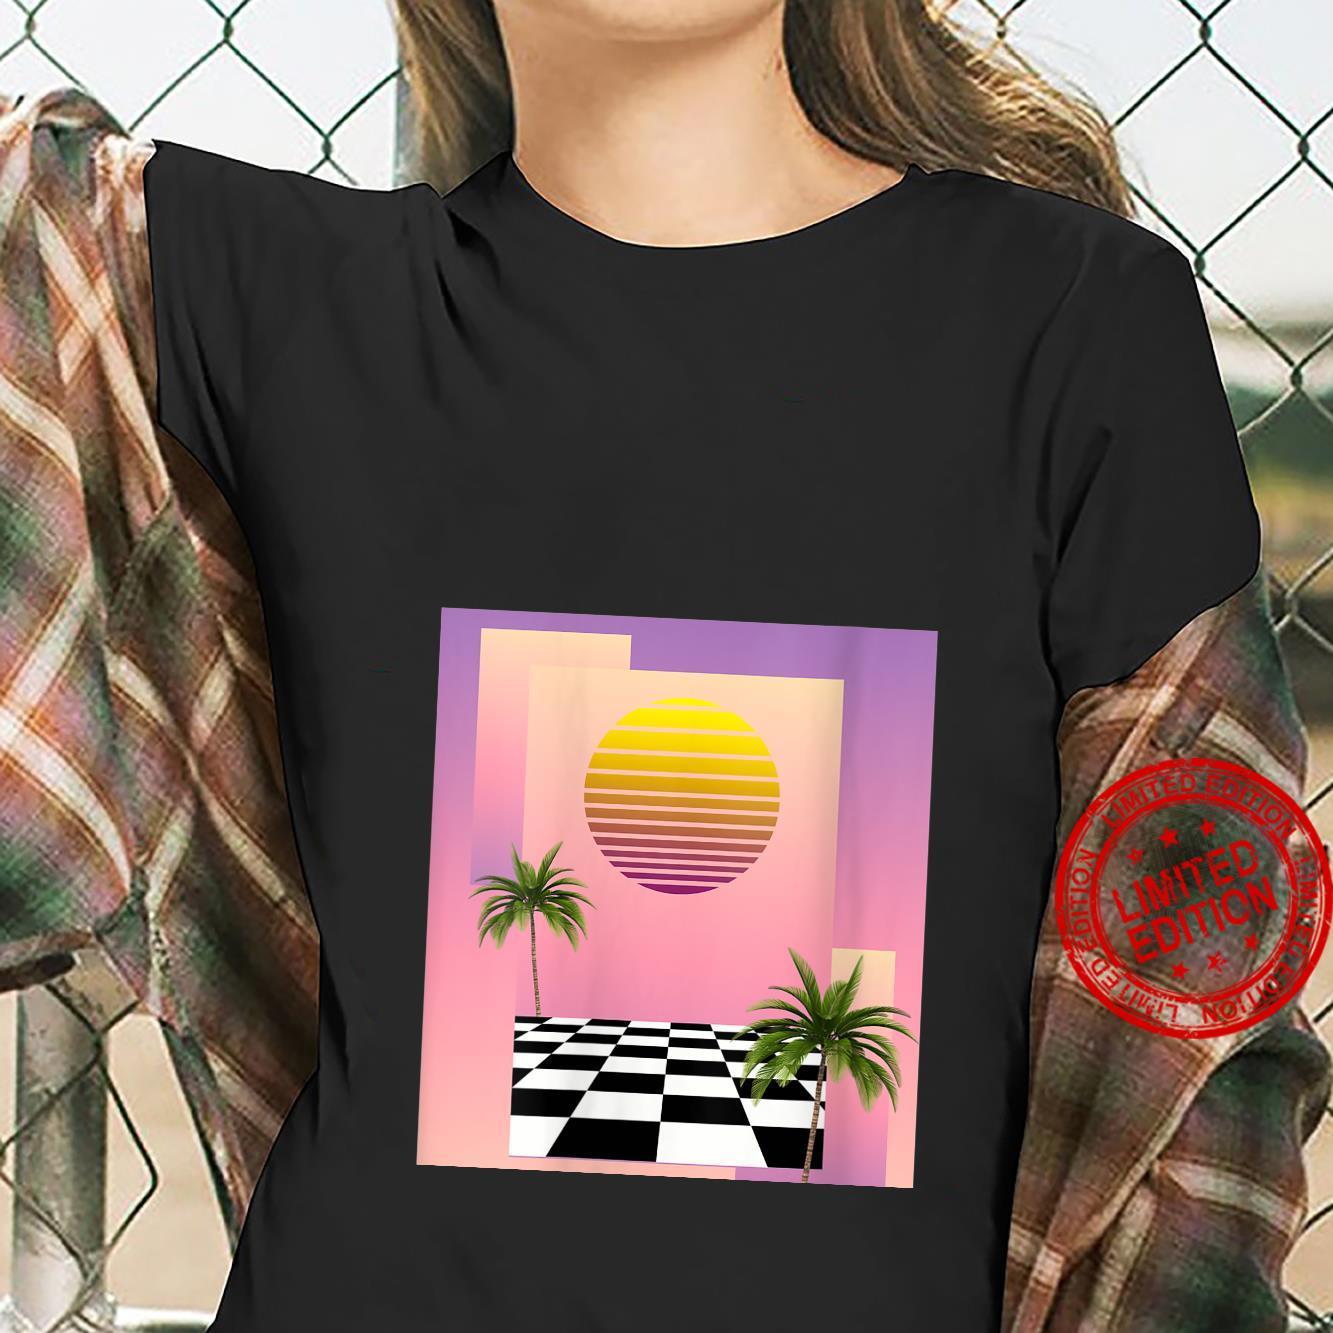 Womens Retro 80s Aesthetic Vaporwave Sunset with palm trees Shirt ladies tee